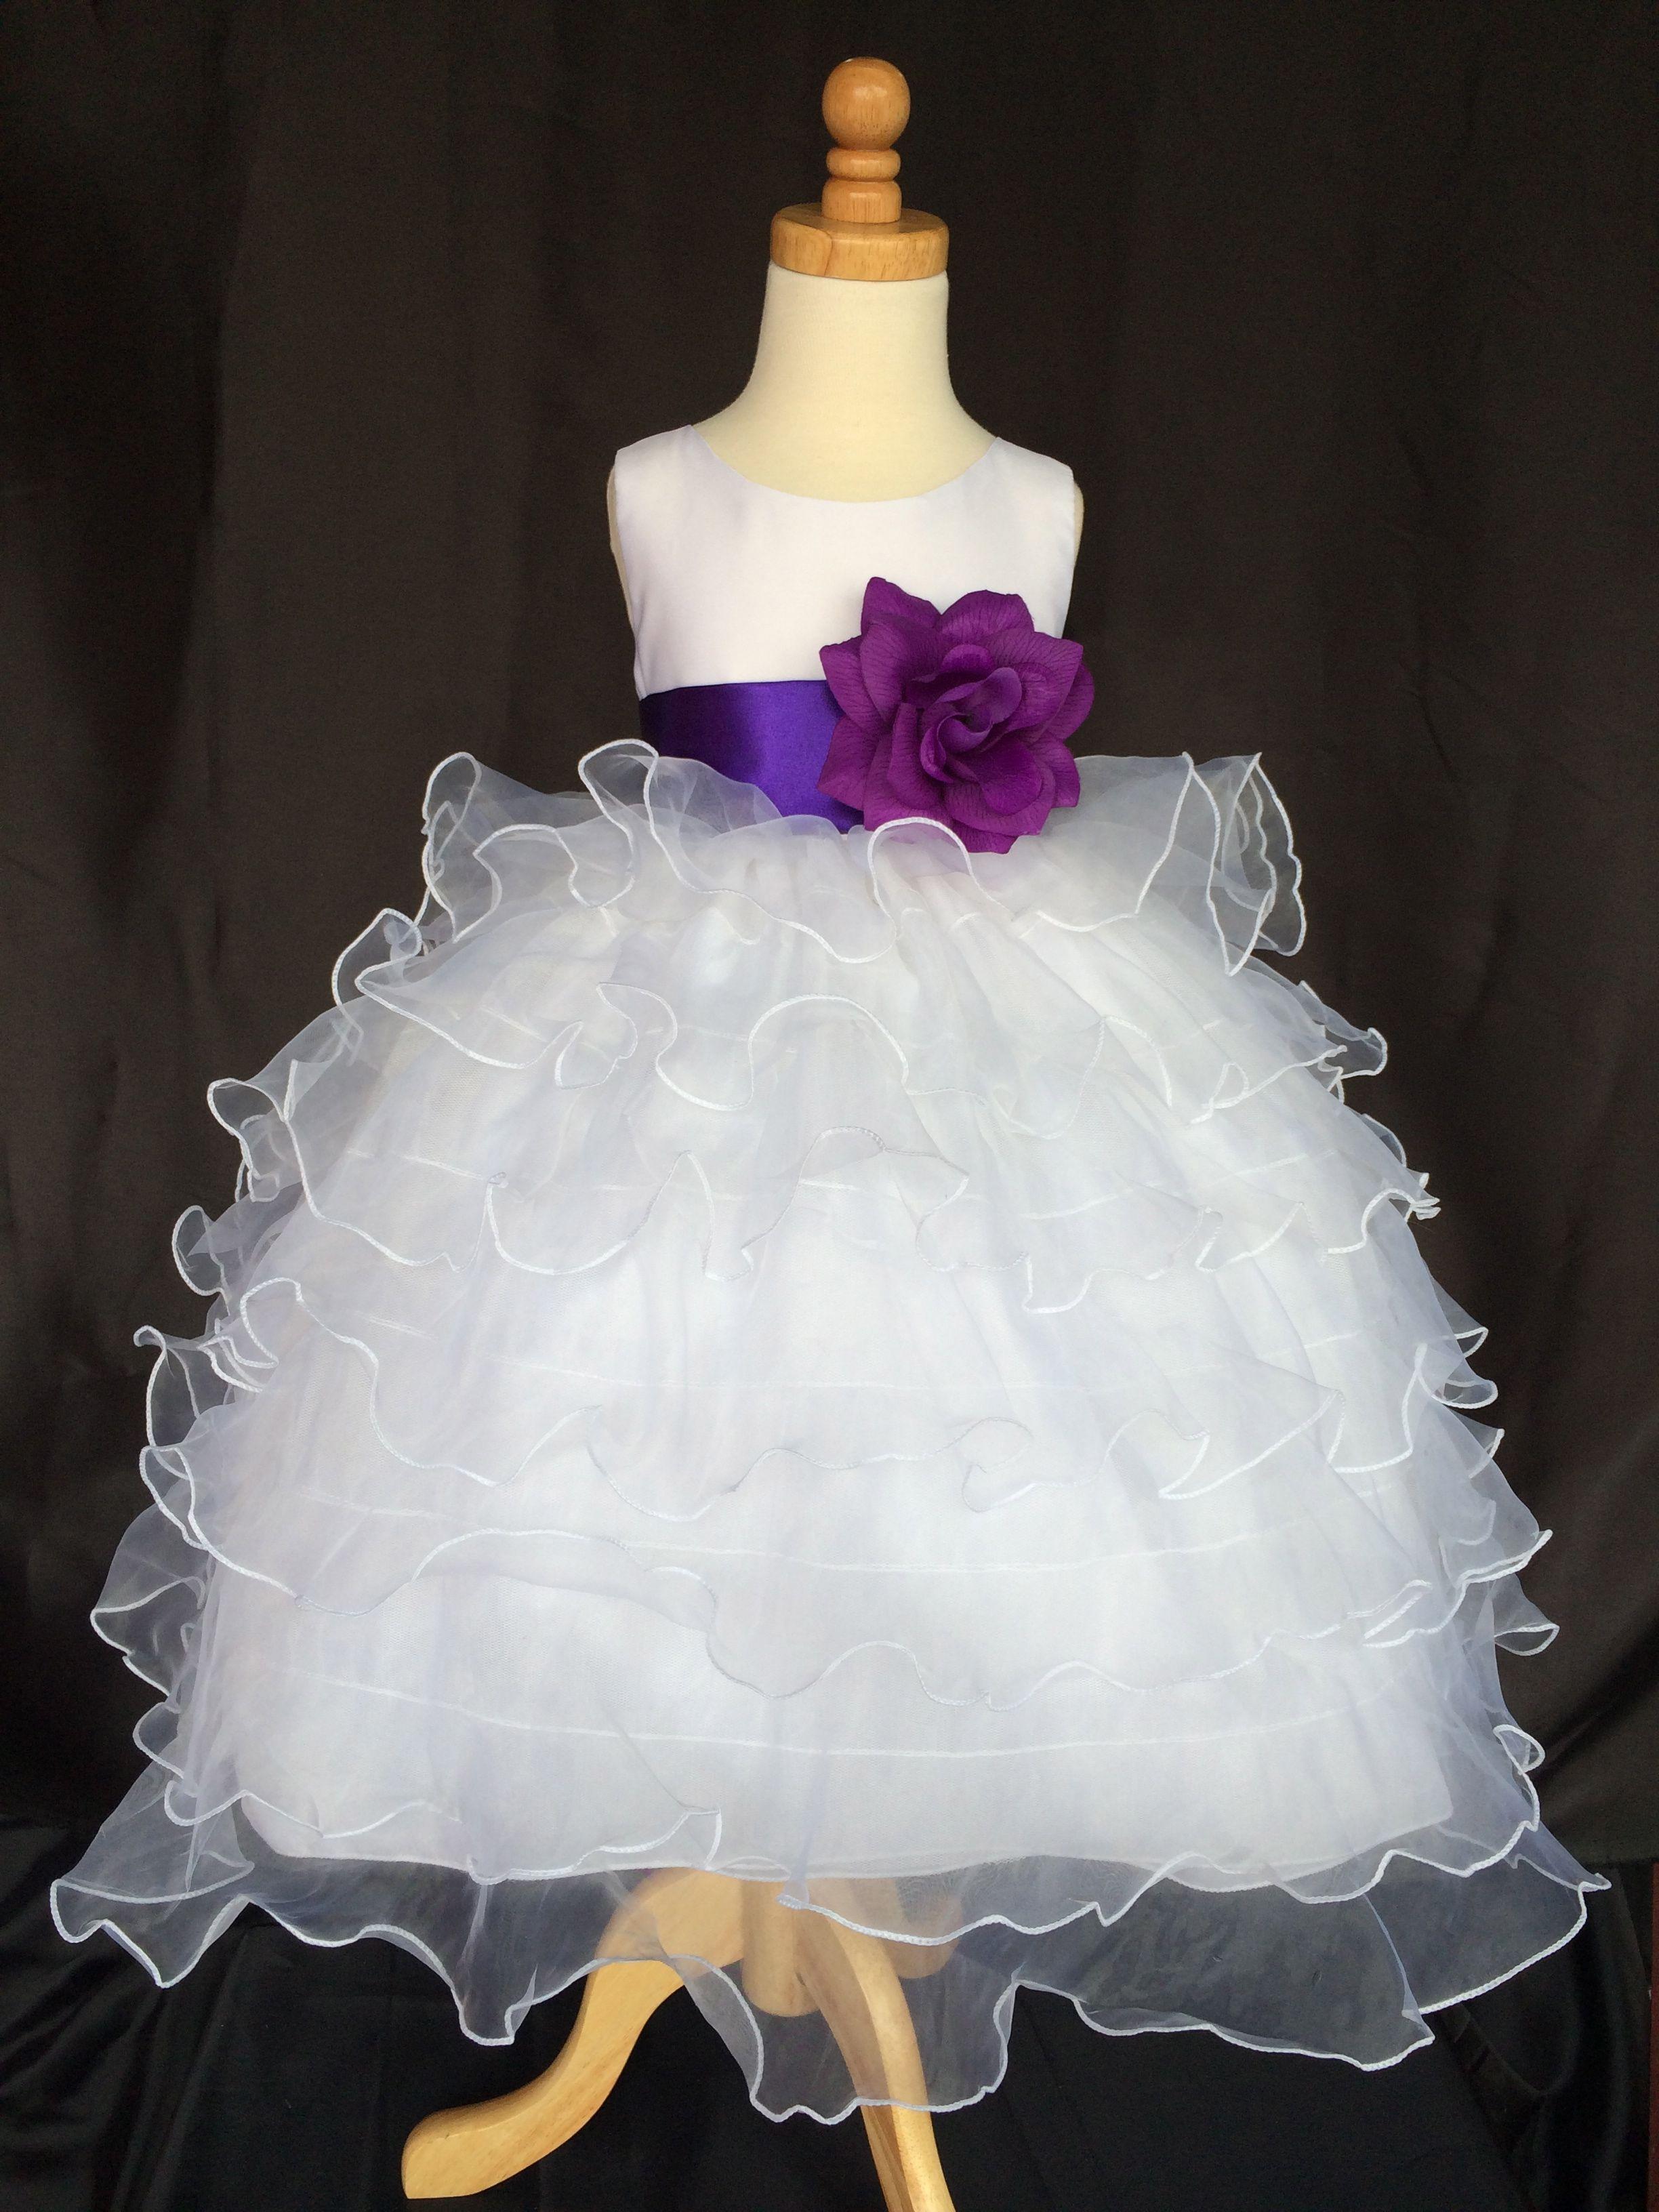 Flower Girl Bridesmaids Wedding White Organza Dress Lovely Sash And